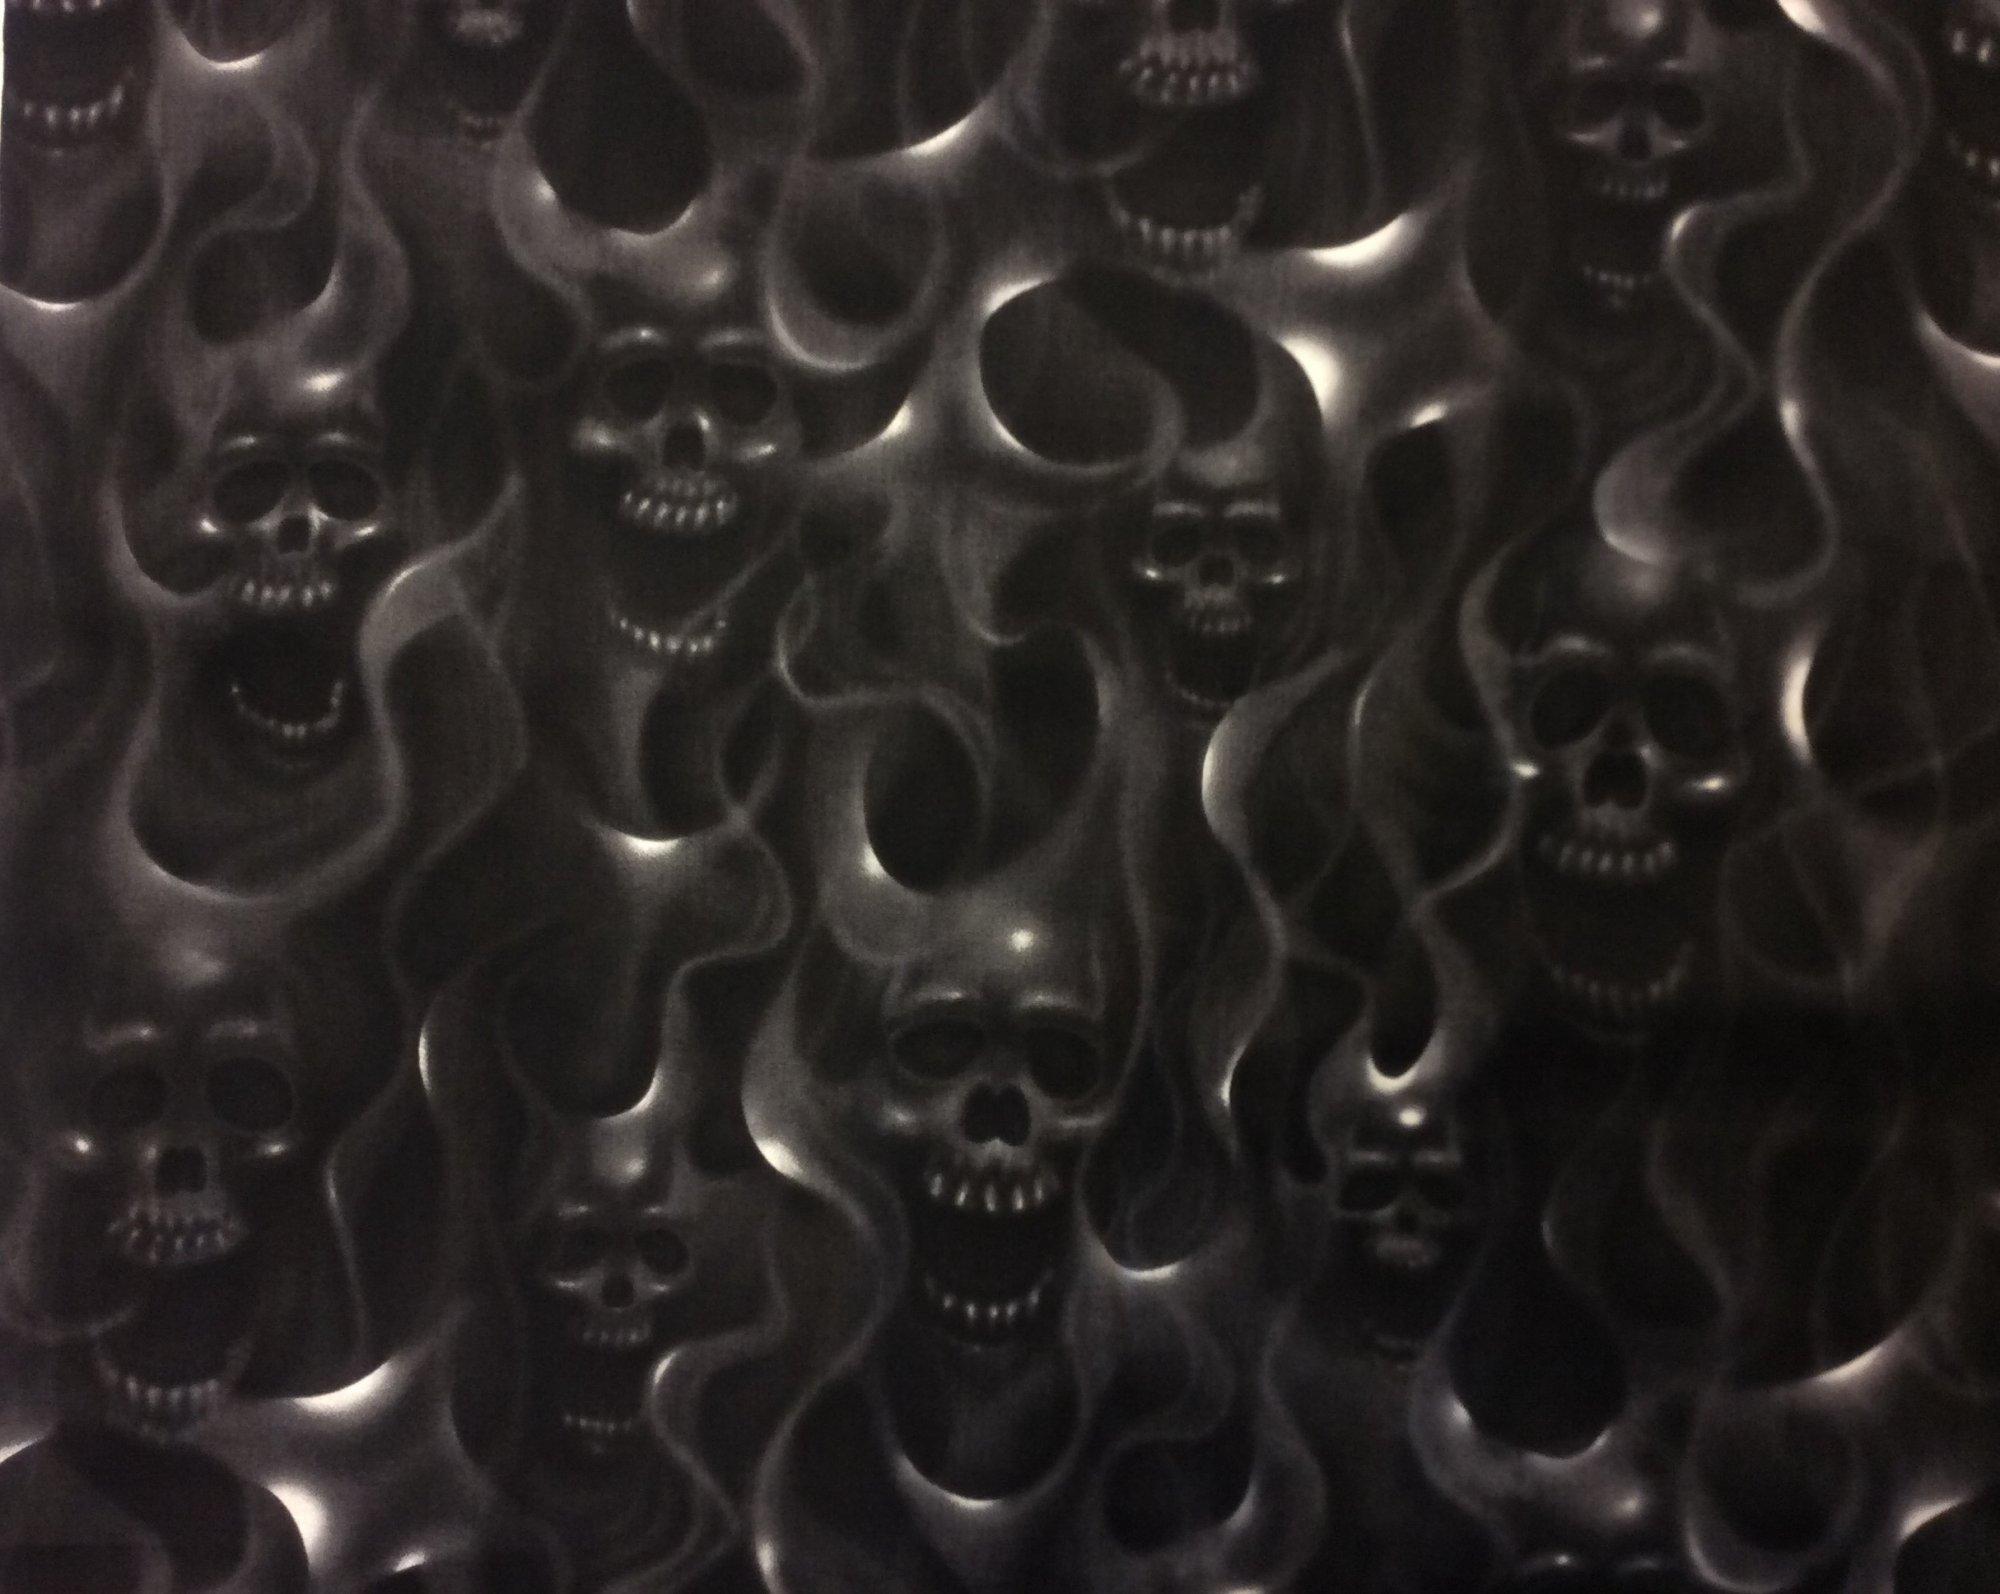 Skull Fire Flame Air Brush Biker Goth Outsider Art Skulls Smoke Charcoal Cotton fabric Quilt Fabric AH231